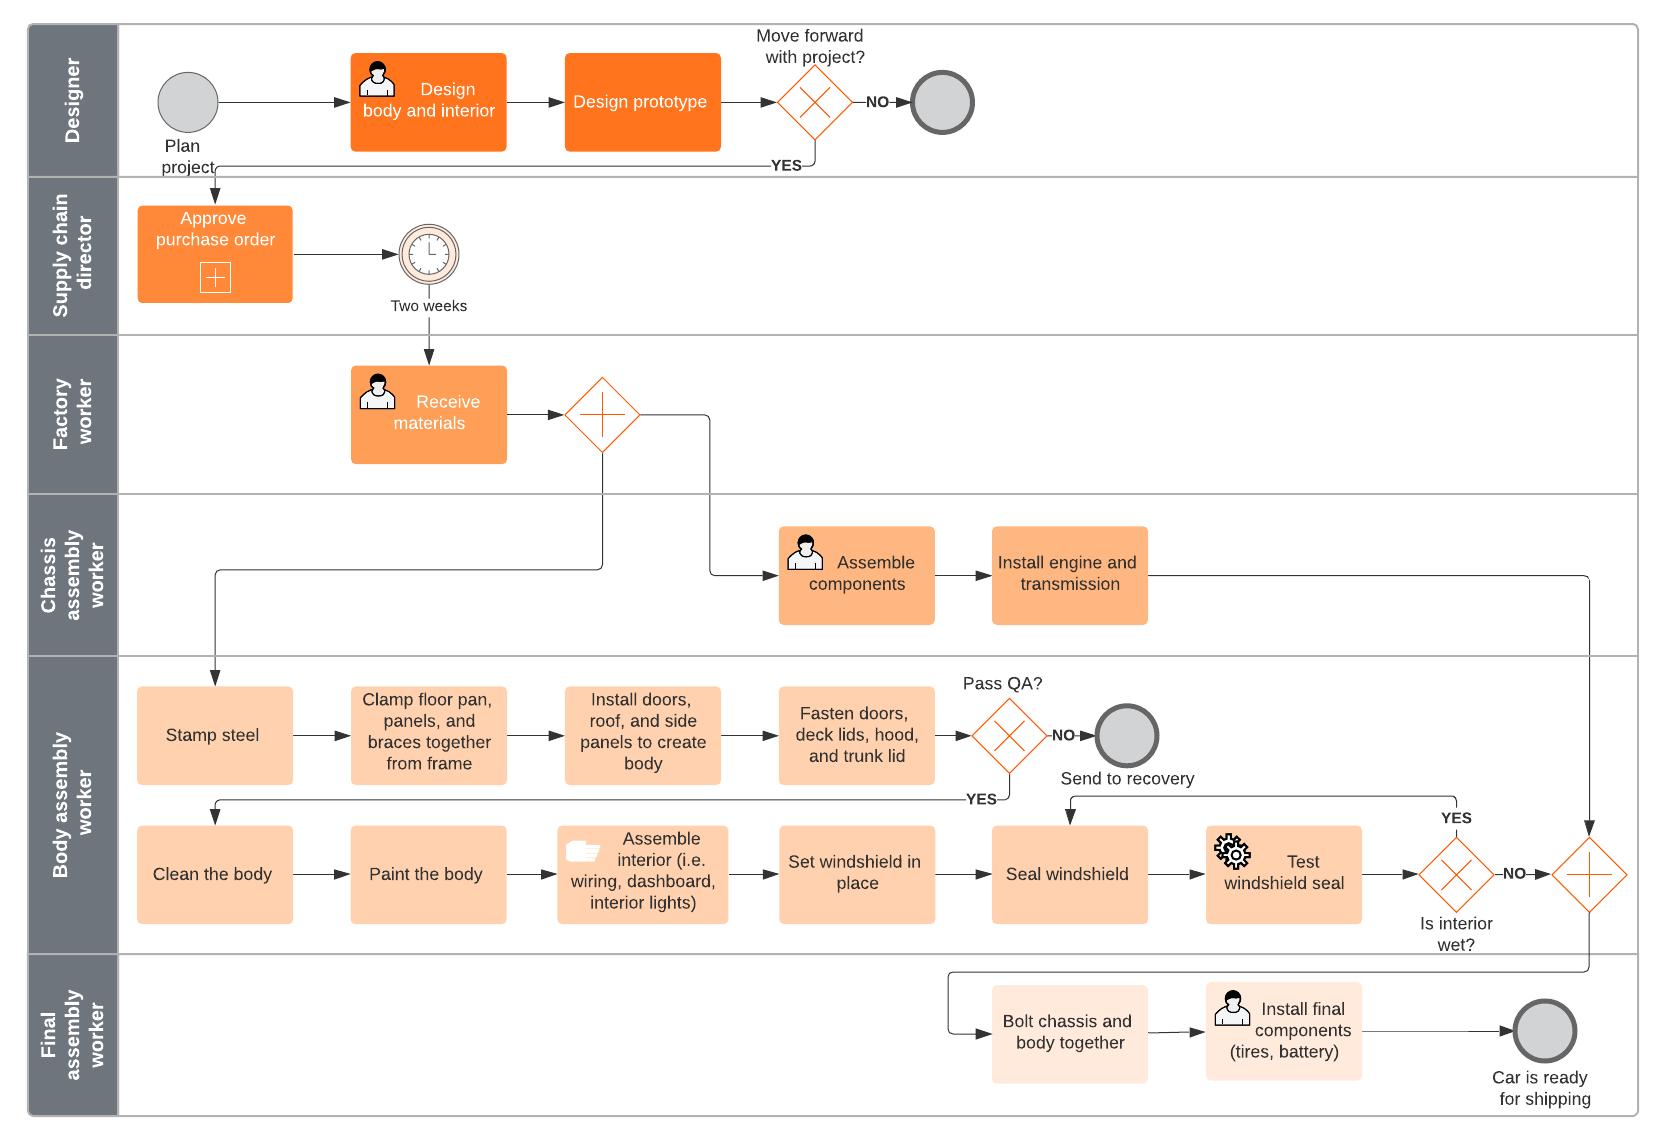 BPMN process flow